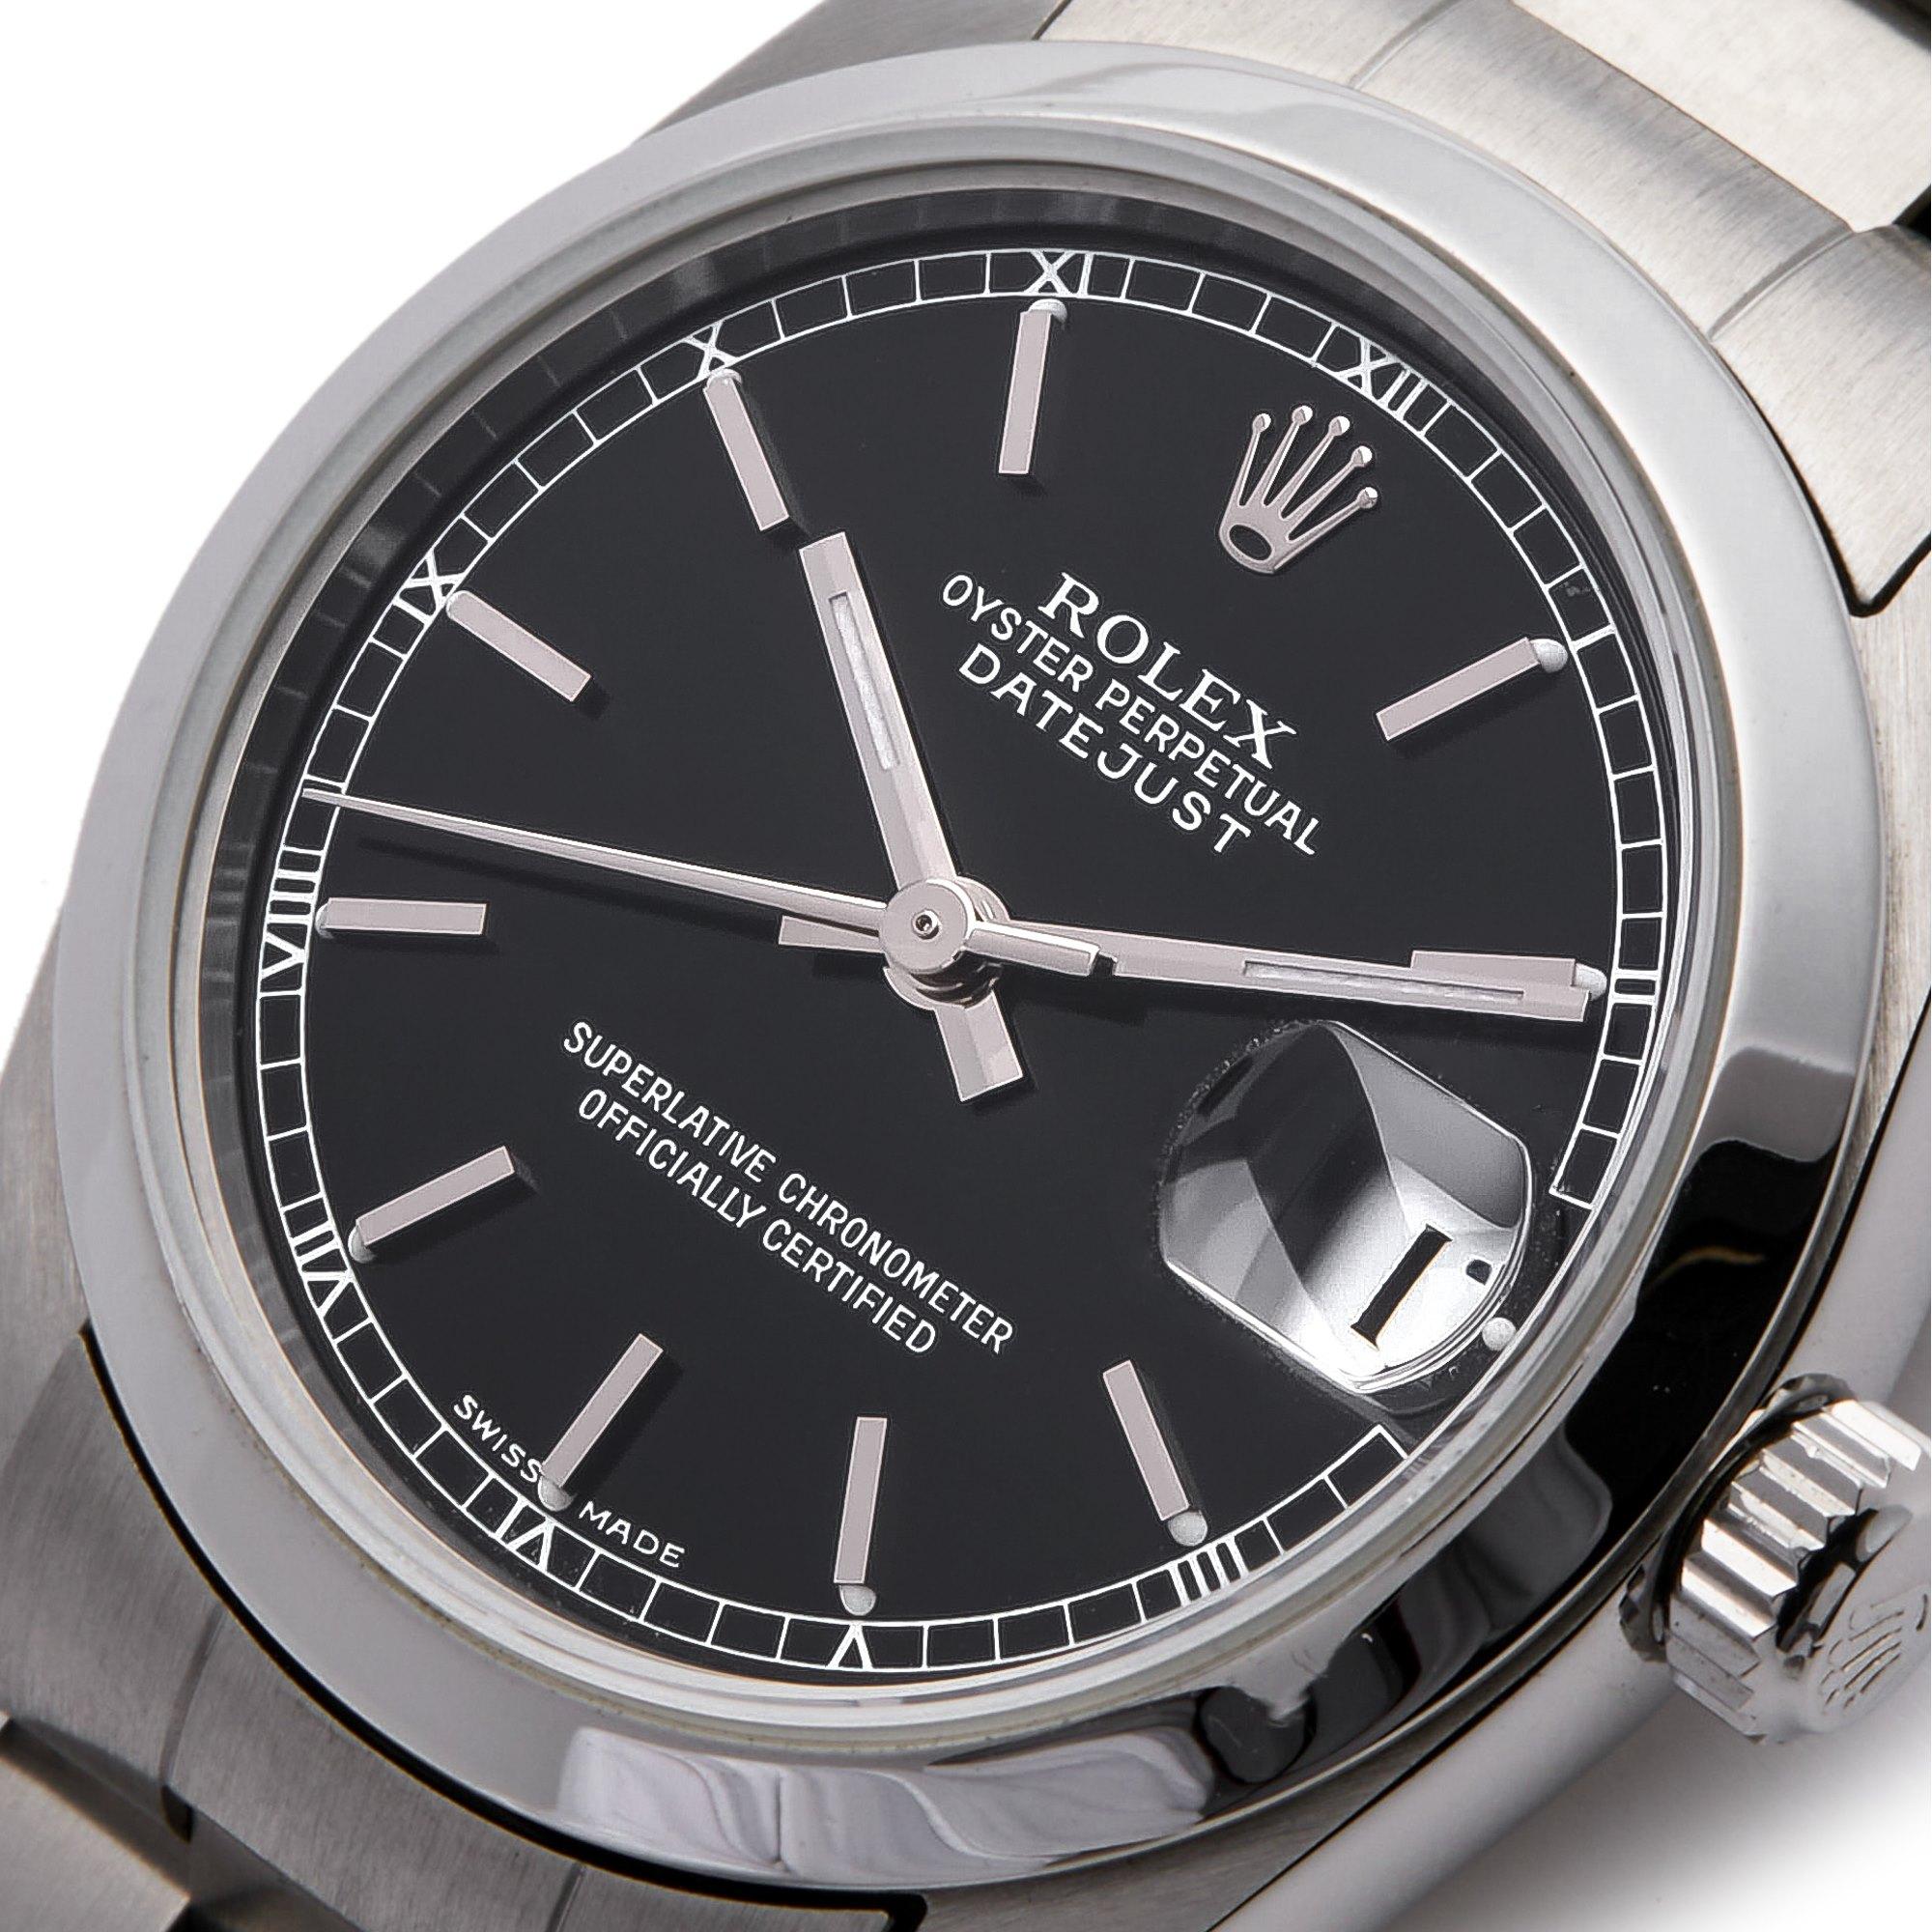 Rolex Datejust 31 Stainless Steel 78240